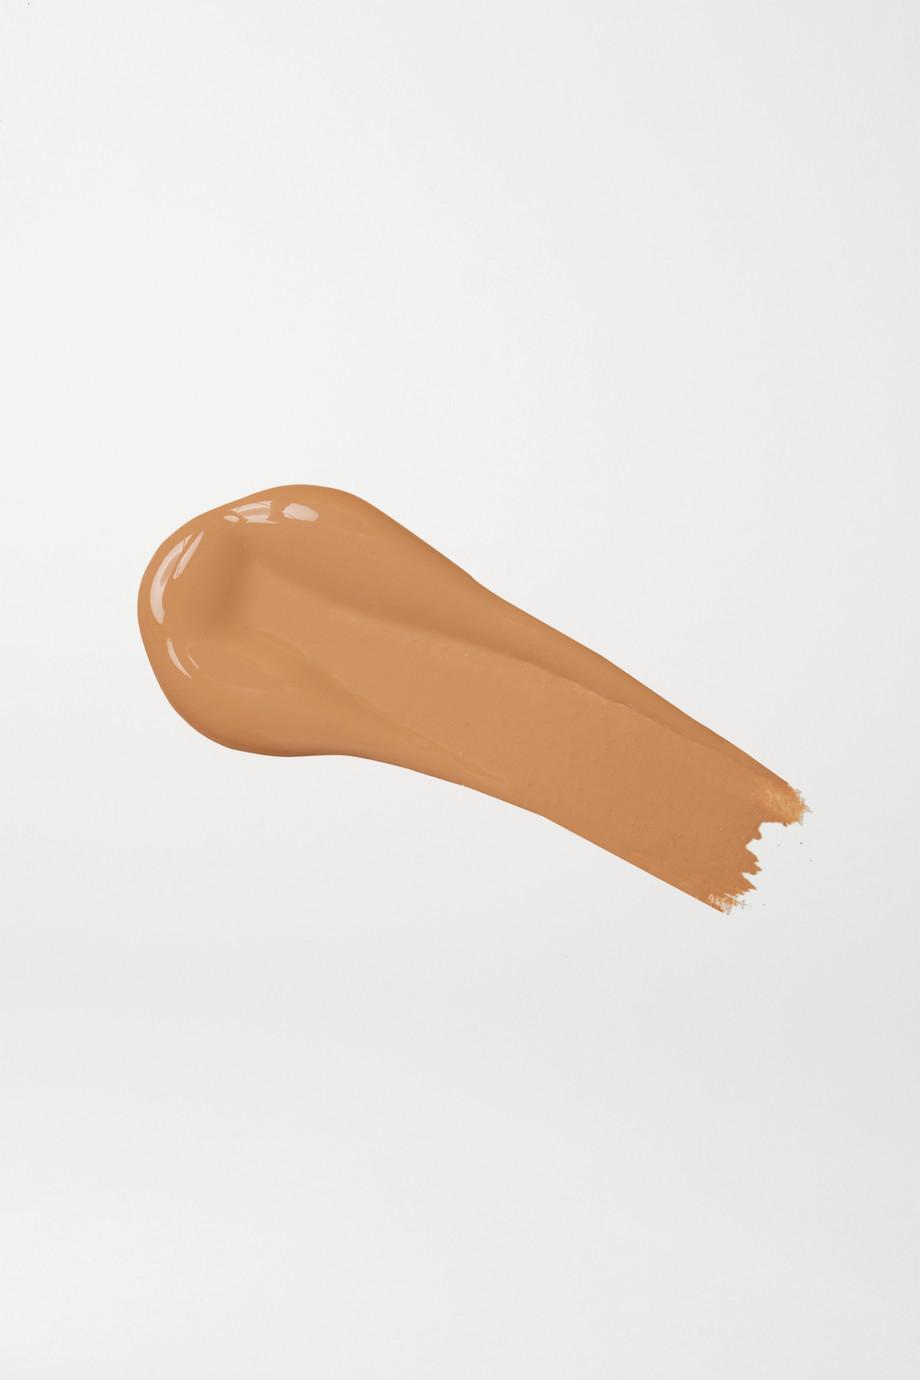 Kosas Revealer Super Creamy + Brightening Concealer - 6.2